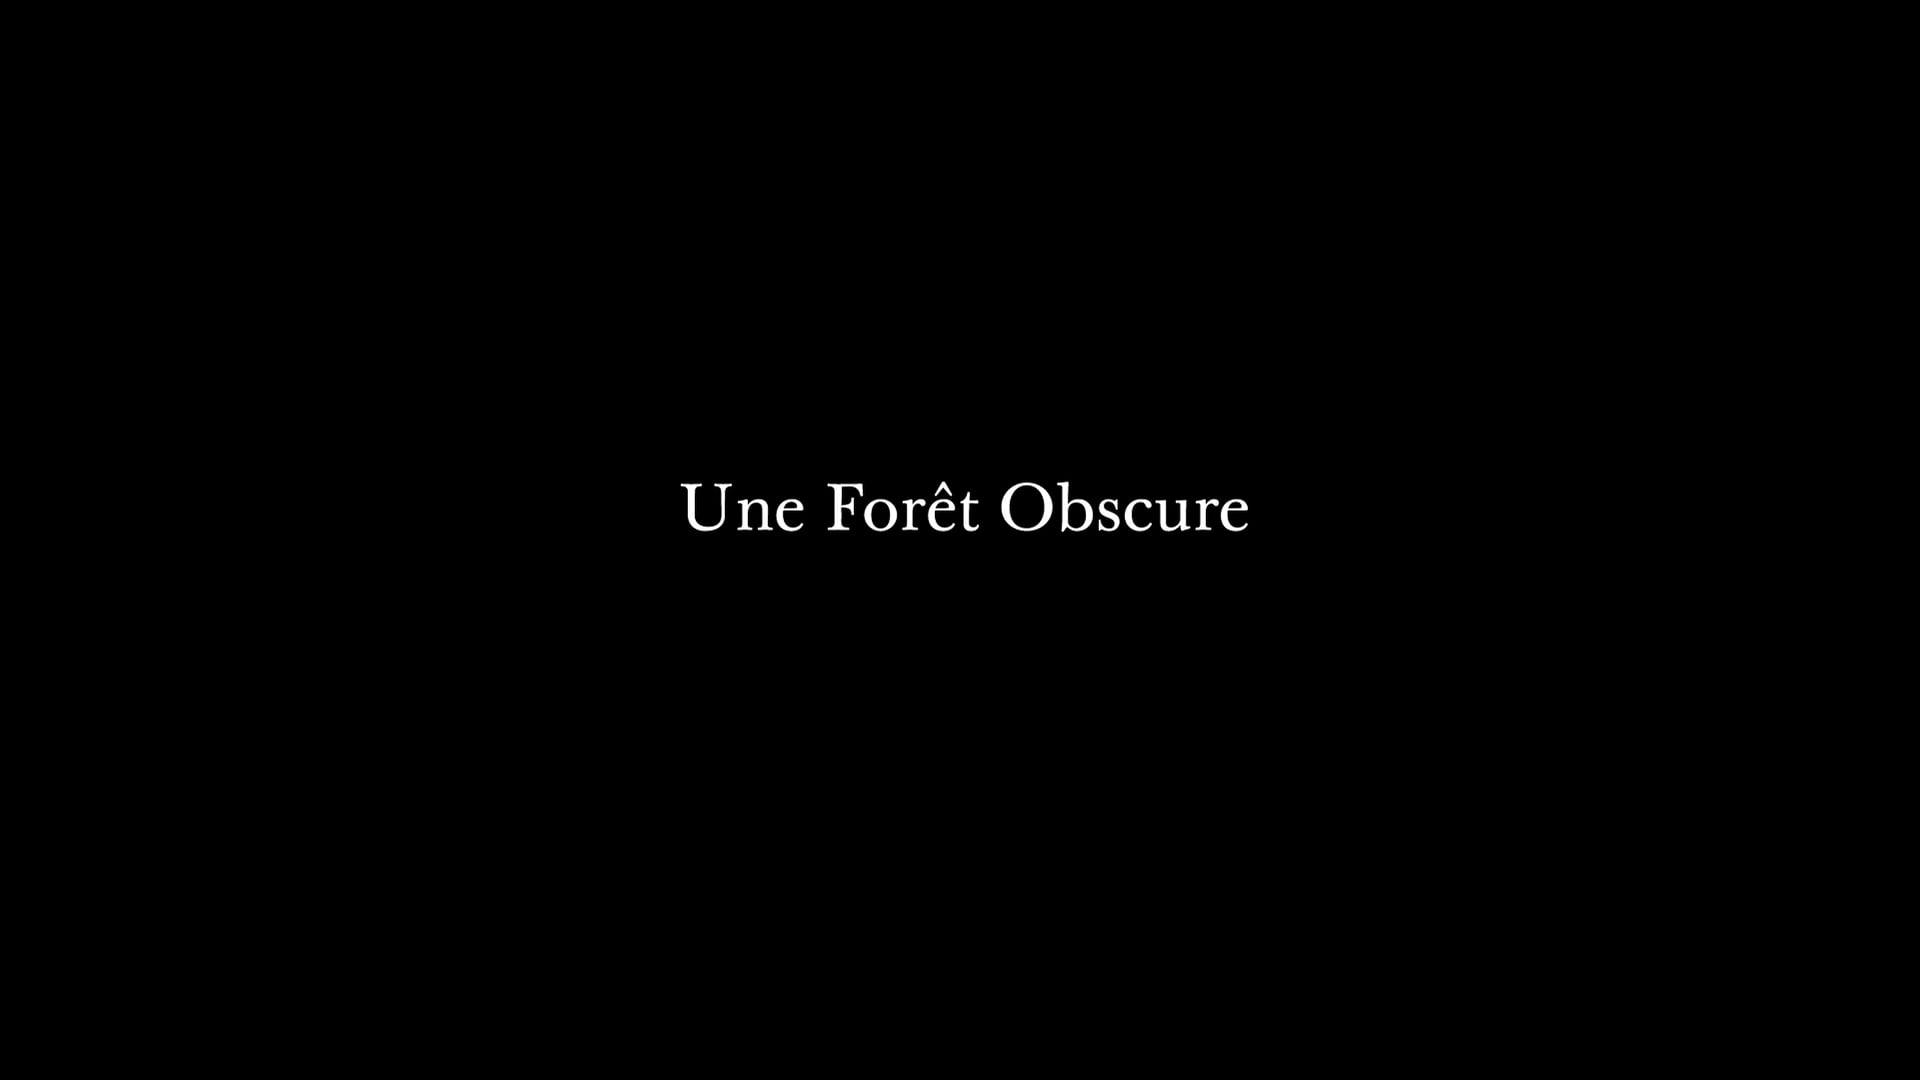 UNE FORÊT OBSCURE / TRAILER